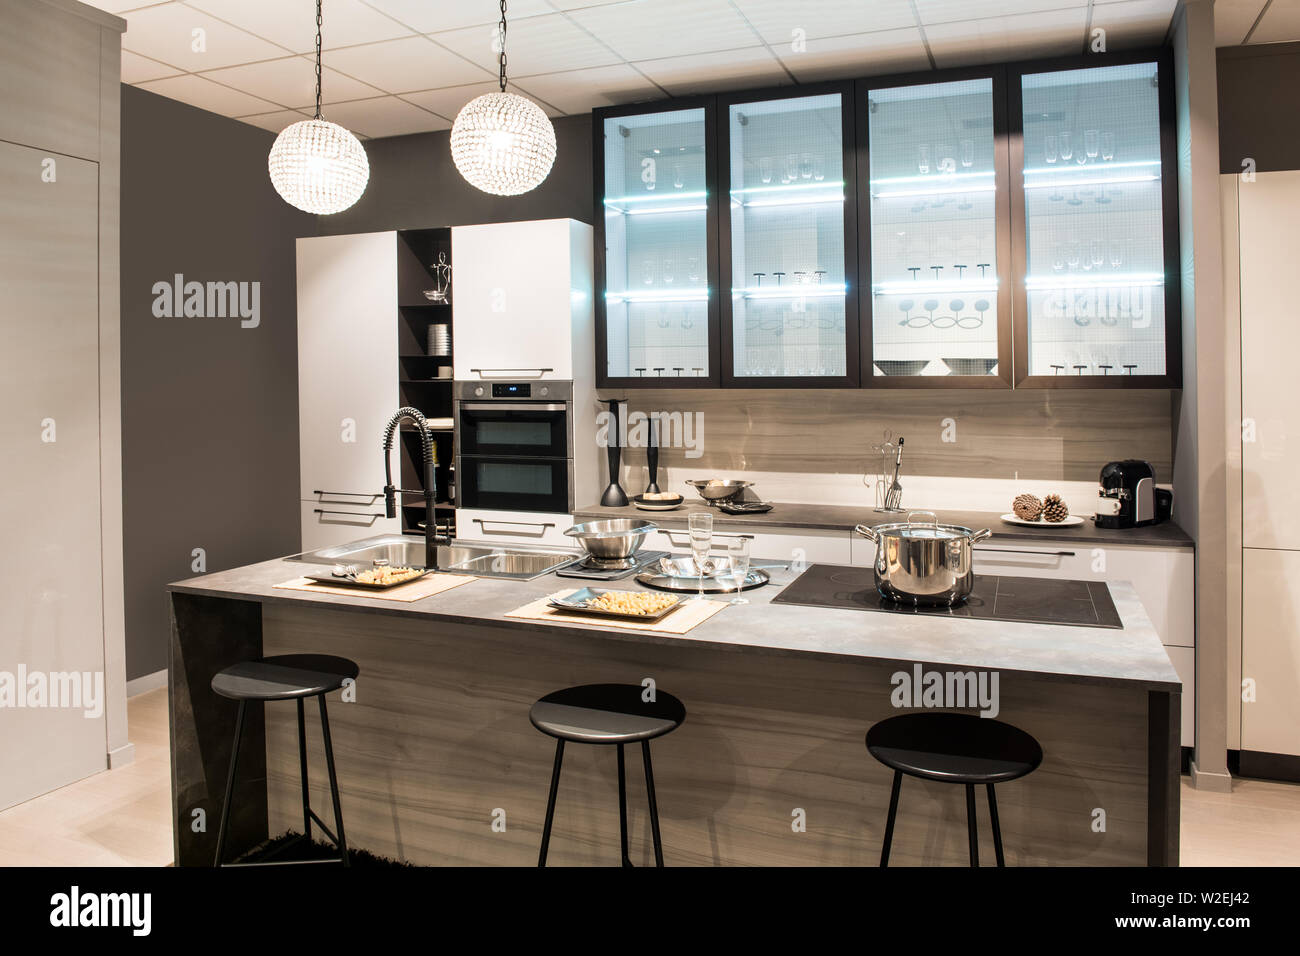 Moderna cocina con isla central y taburetes con modernos ...